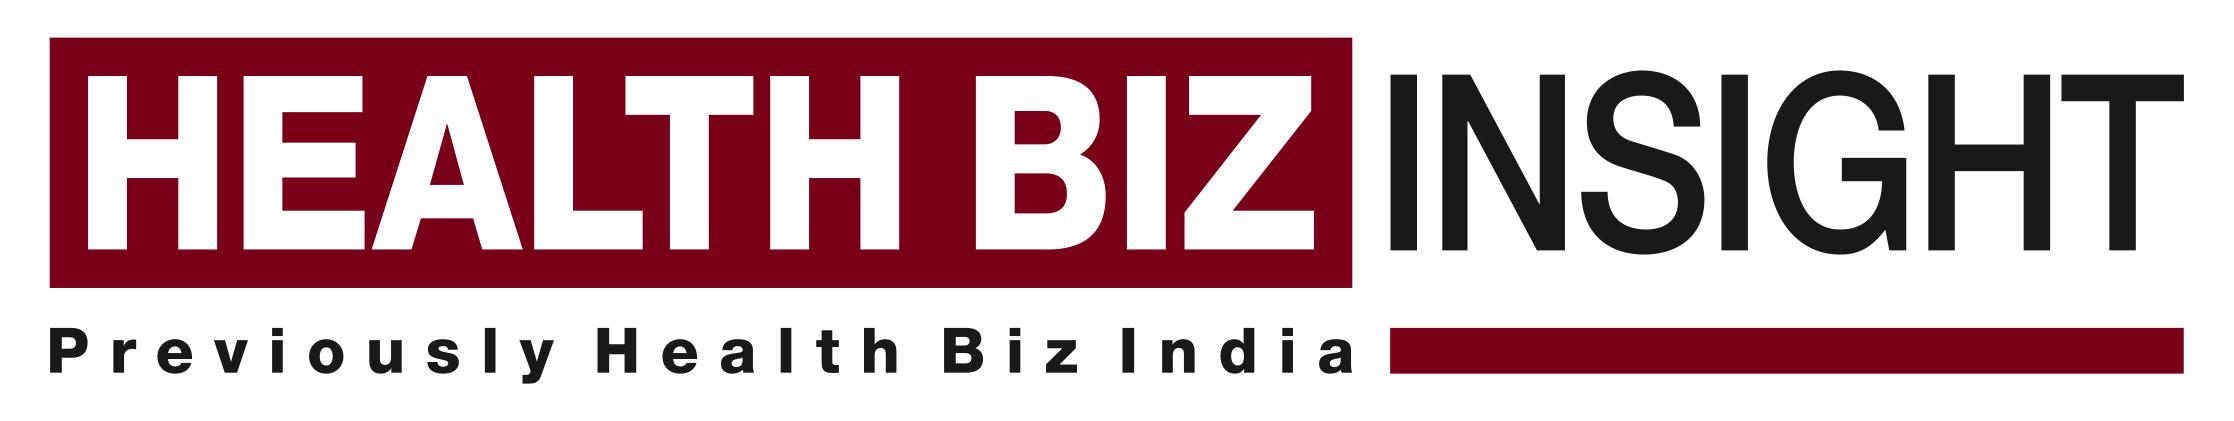 HBI New Logo.jpg